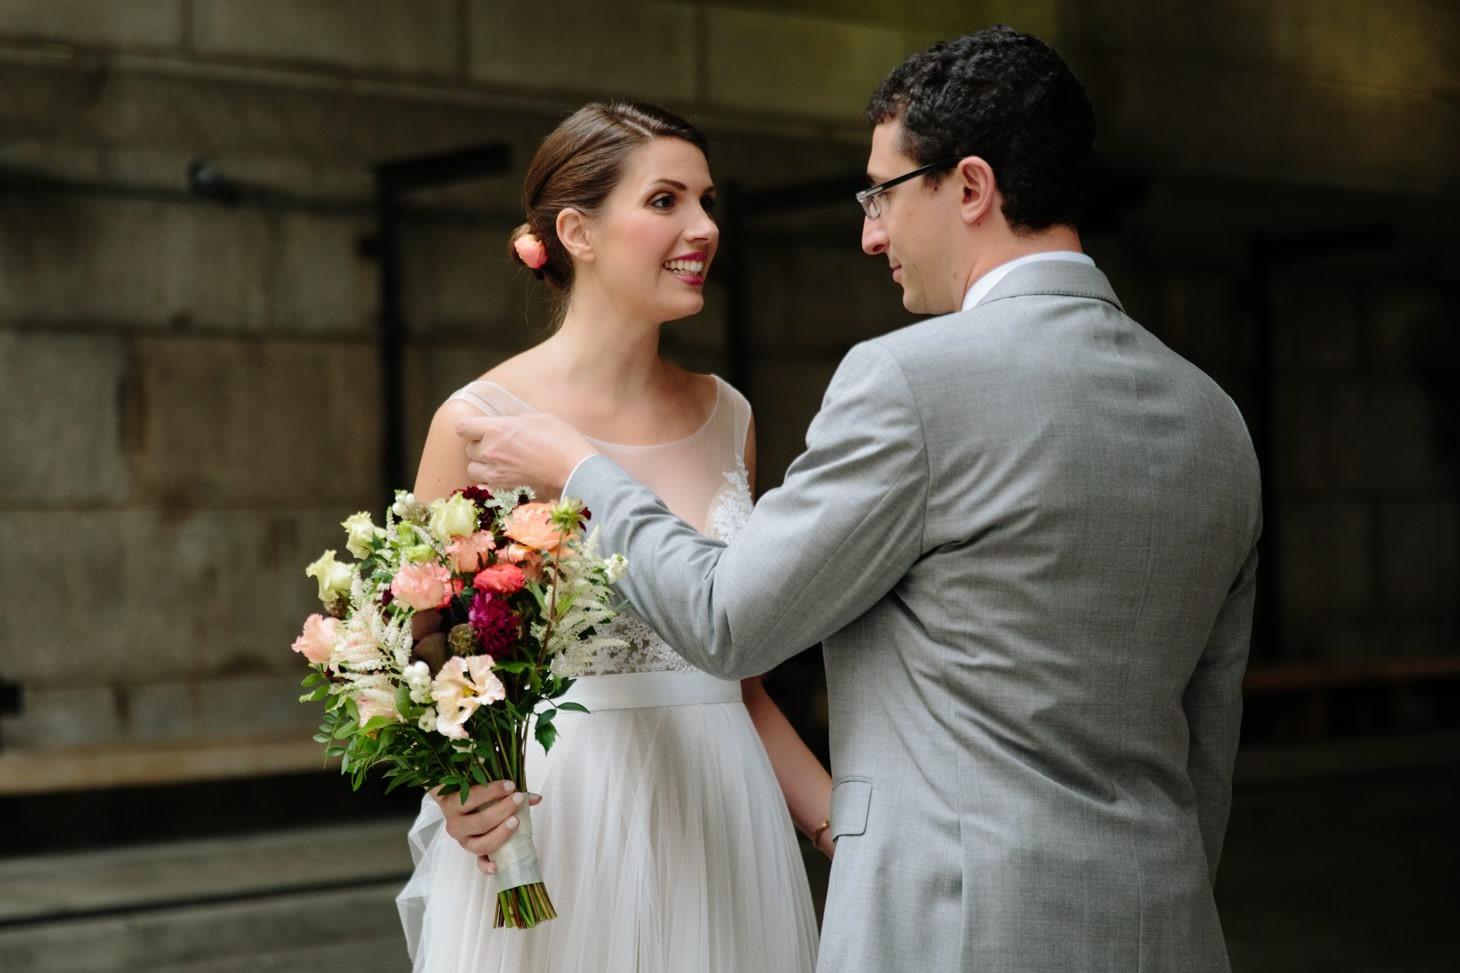 003-nyc-dumbo-loft-brooklyn-wedding-photographer-smitten-chickens-photo-.jpg